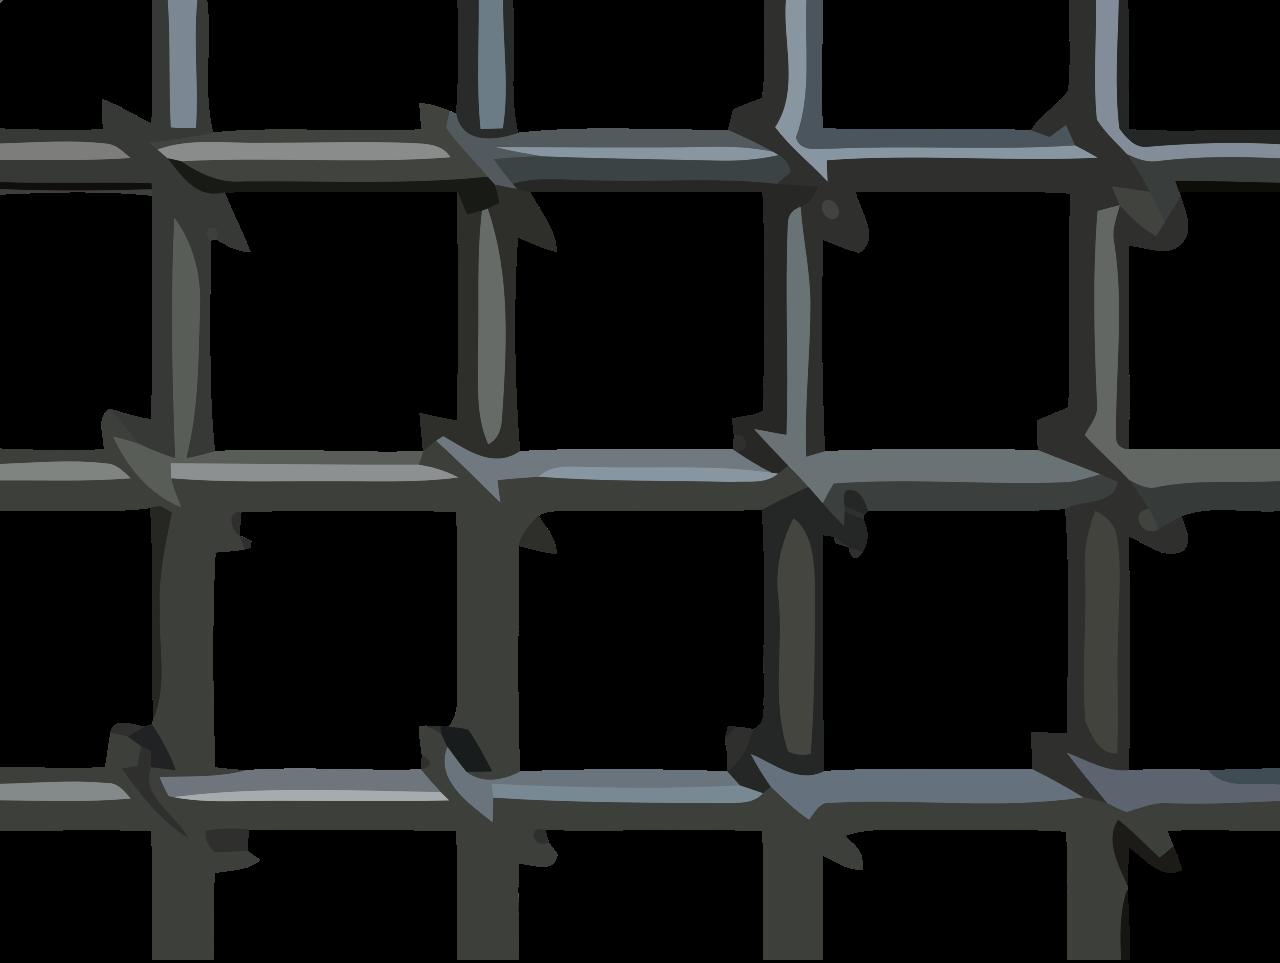 Prison png image purepng. Jail clipart behind bar